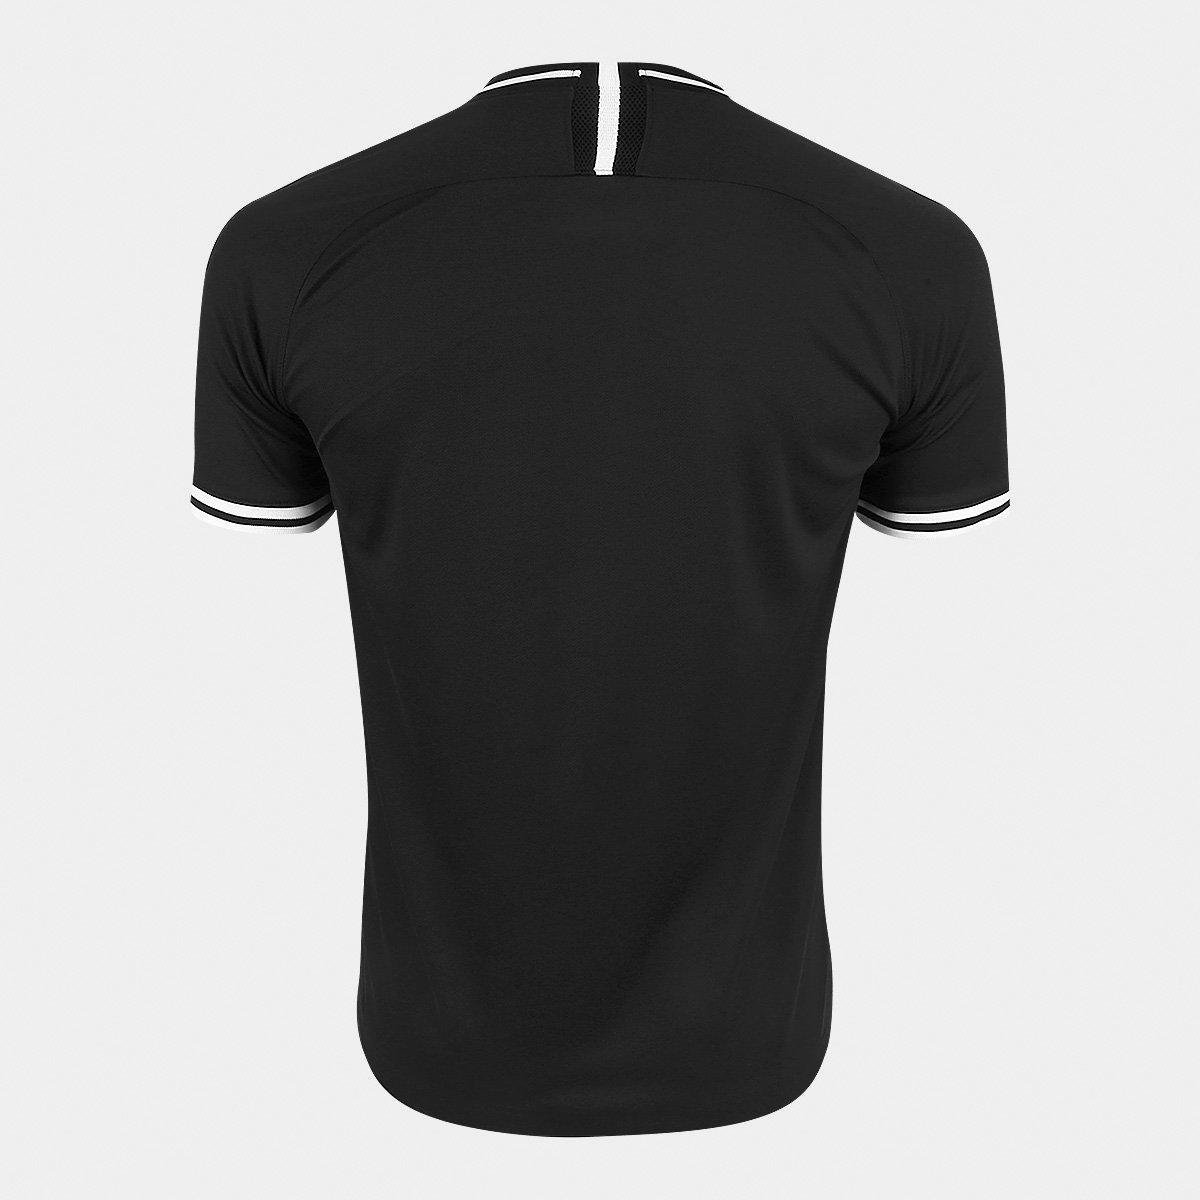 Camisa Corinthians II 19/20 s/nº Torcedor Nike Masculina - Tam: P - 1